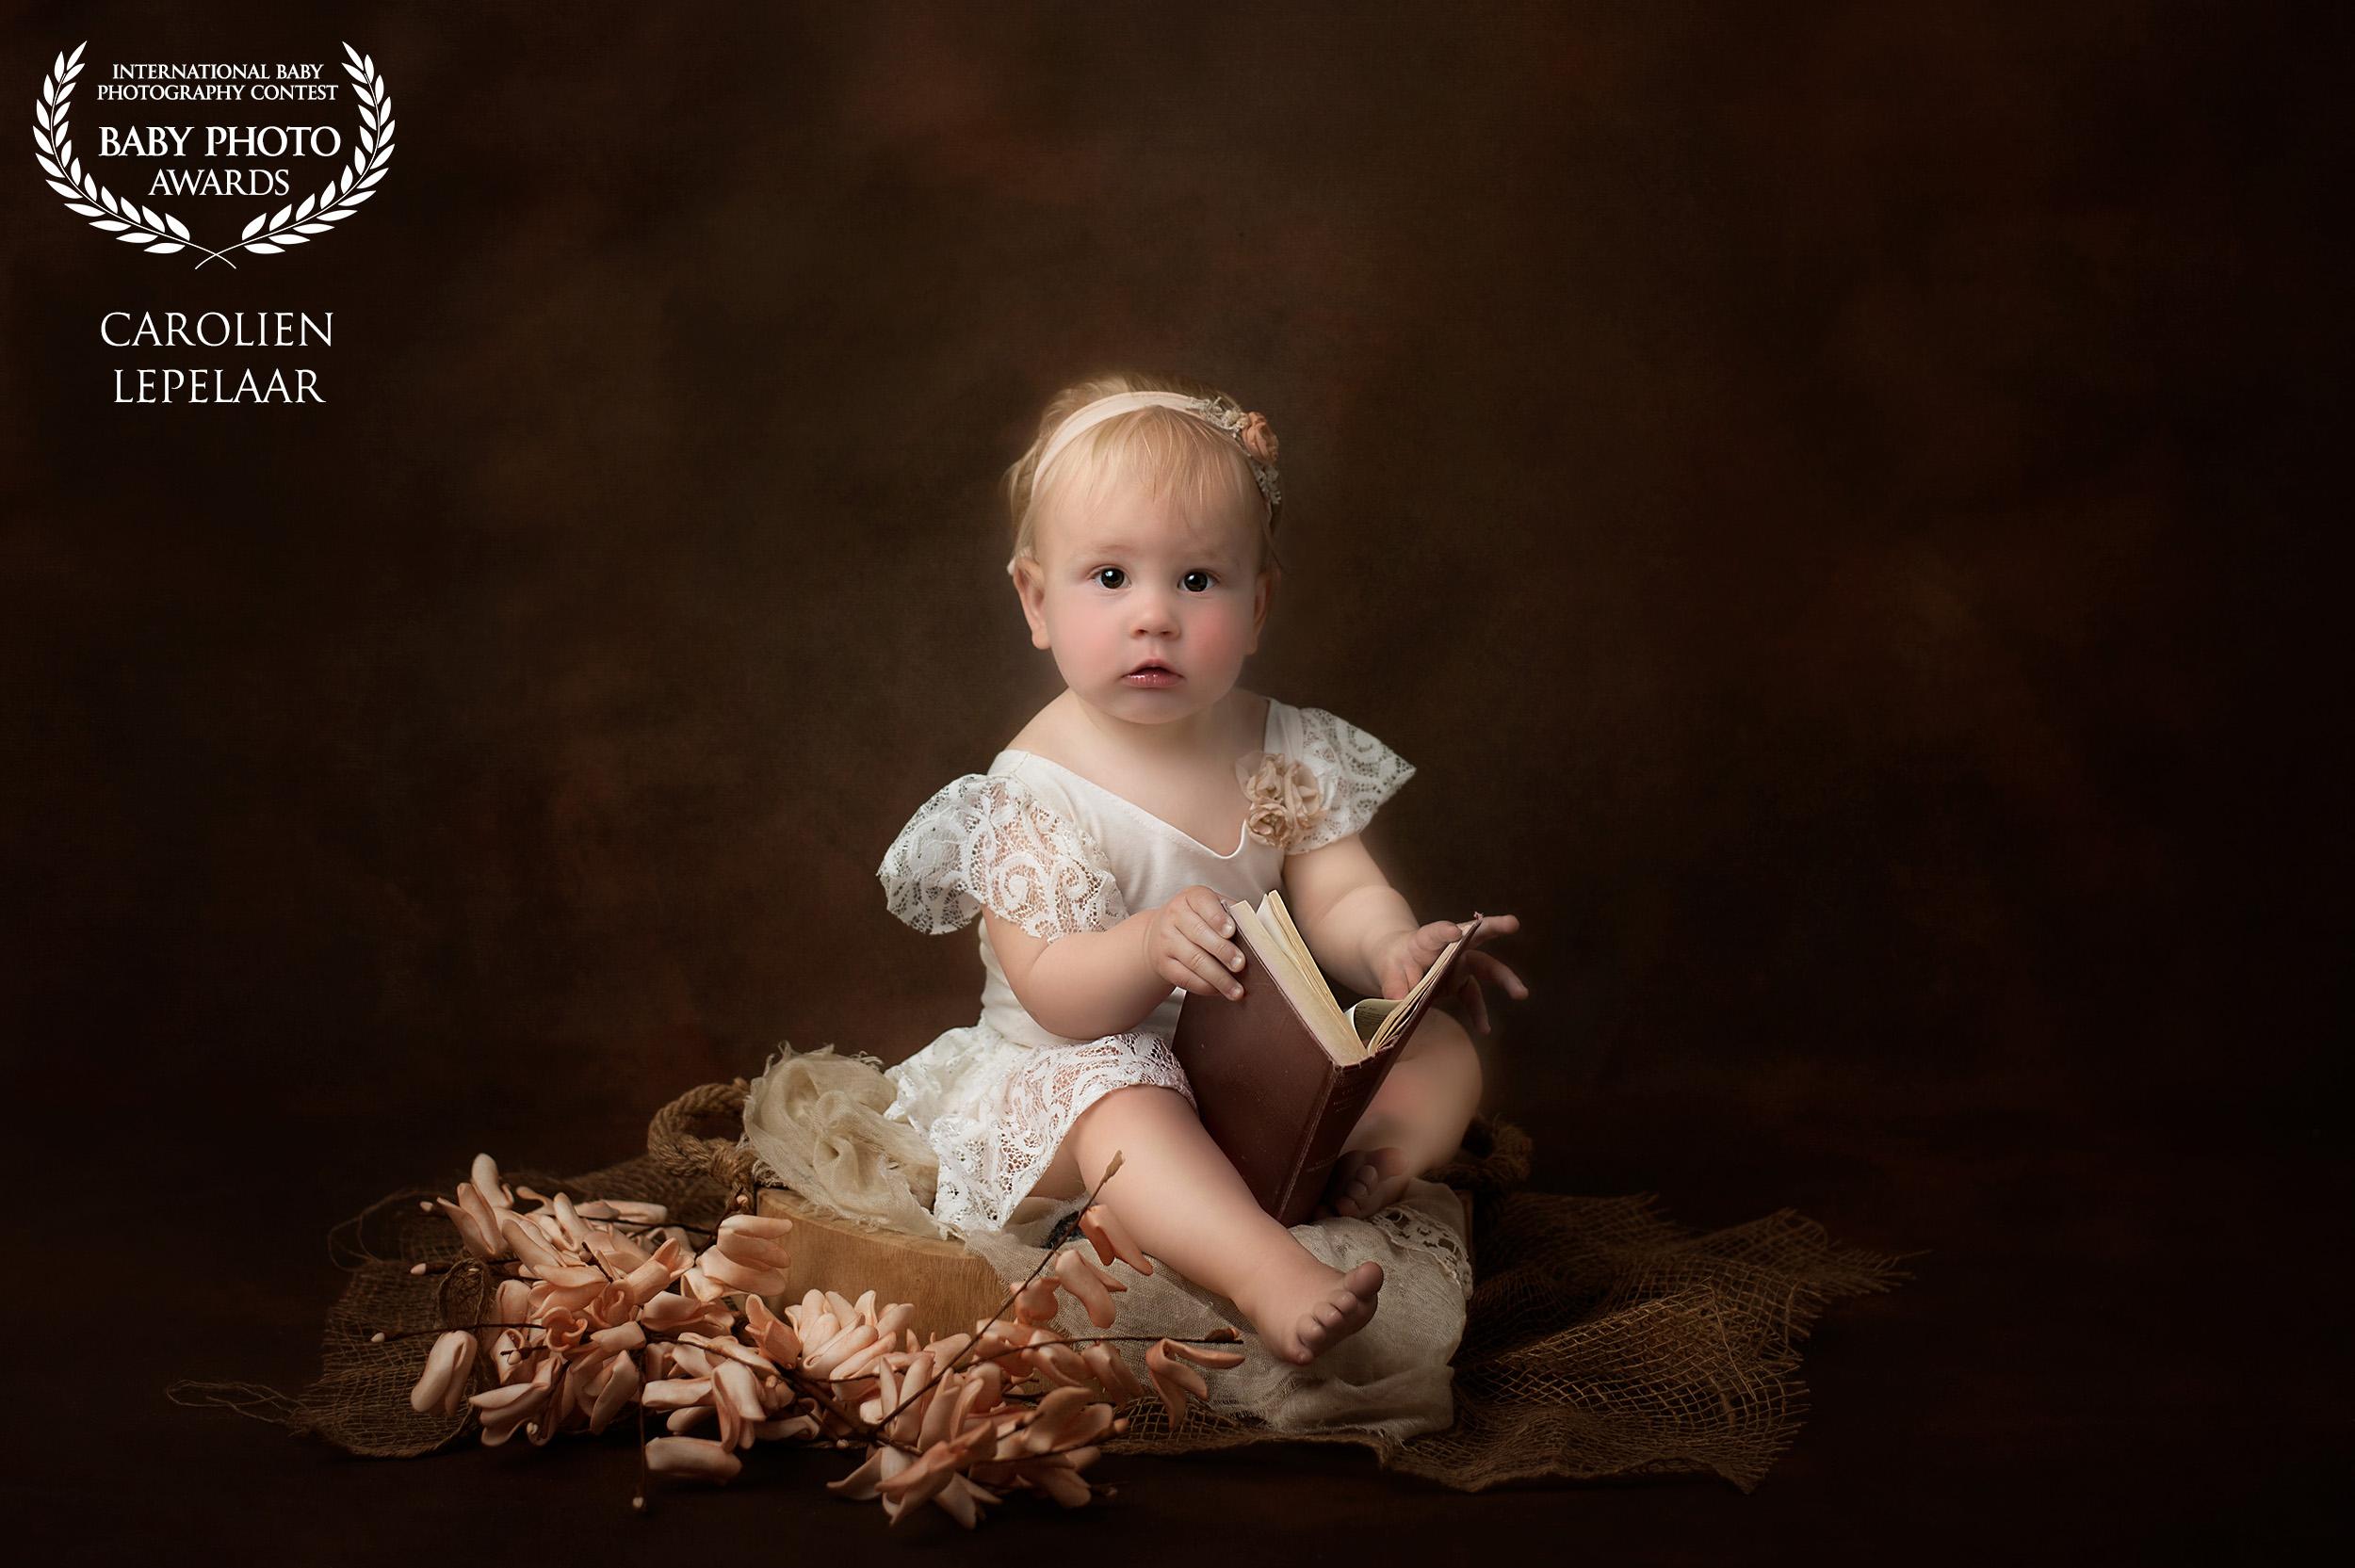 custom_logo_CAROLIEN-LEPELAAR-netherlands-50collection-babyphotoawards-com_1591625995